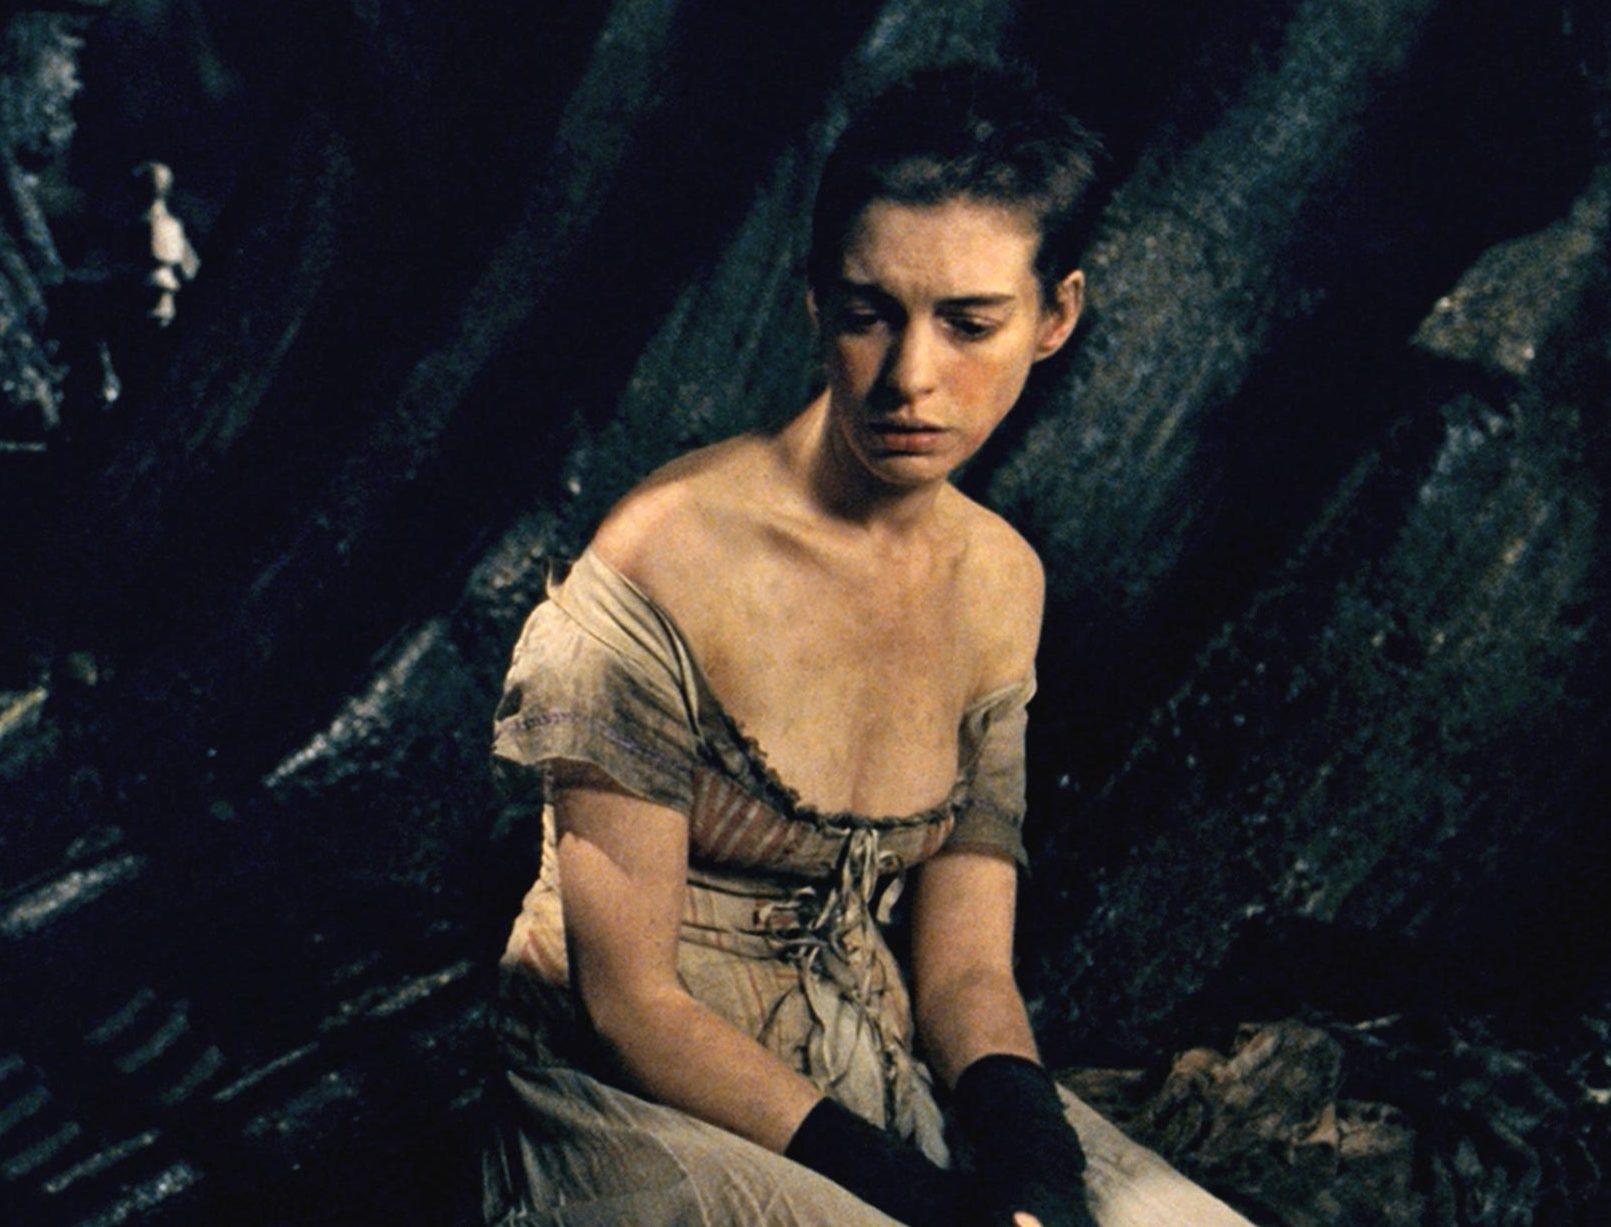 annehmovie 16 9 e1625738839938 25 Things You Didn't Know About Les Misérables (2012)